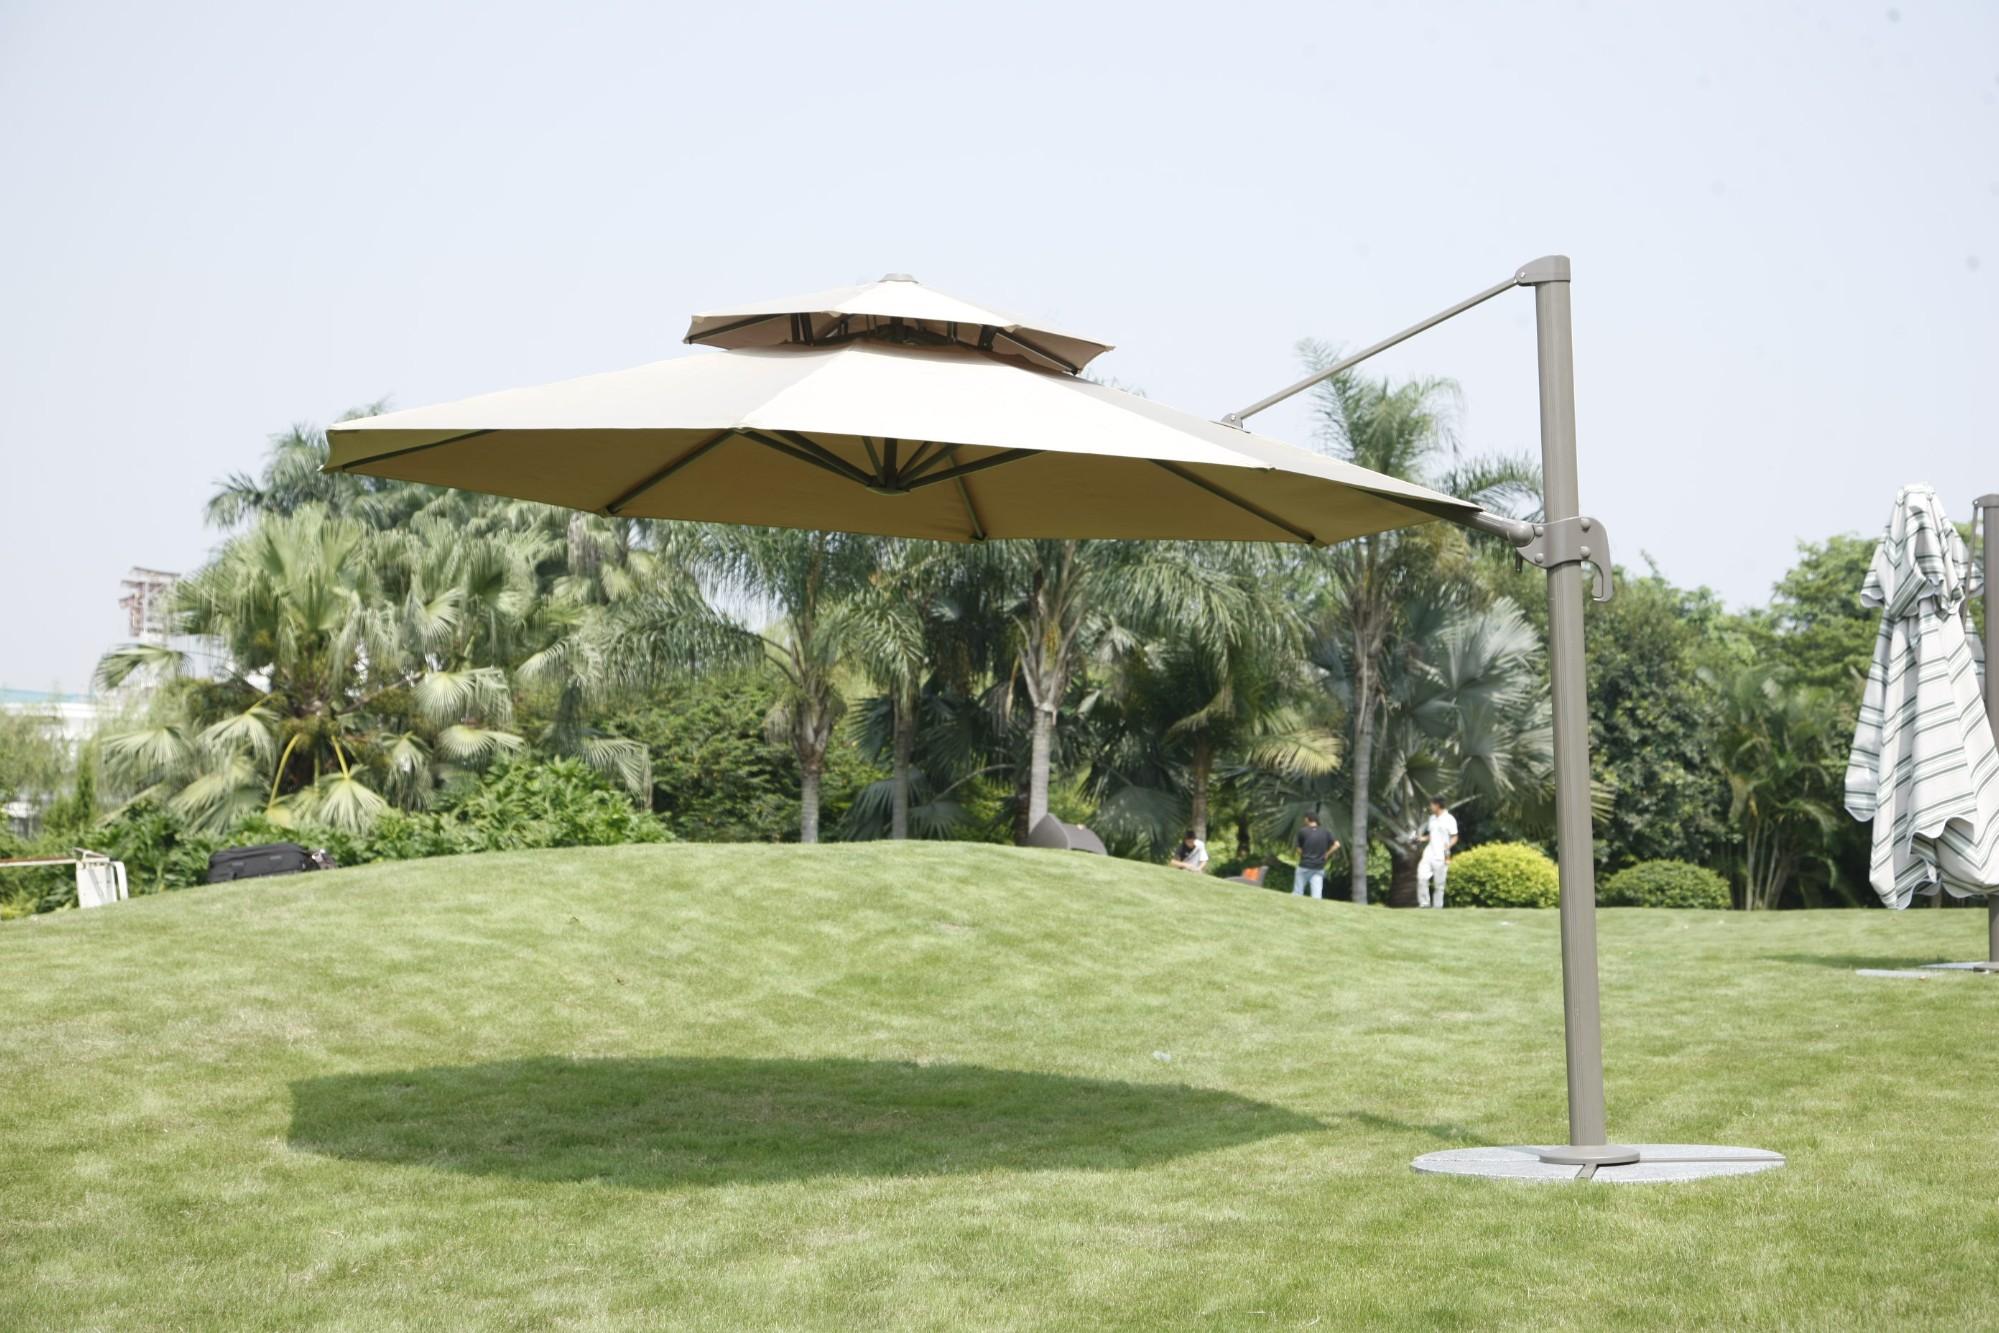 Outdoor Umbrella Garden Parasol Patio Umbrellas Manufacturers, Outdoor Umbrella Garden Parasol Patio Umbrellas Factory, Supply Outdoor Umbrella Garden Parasol Patio Umbrellas